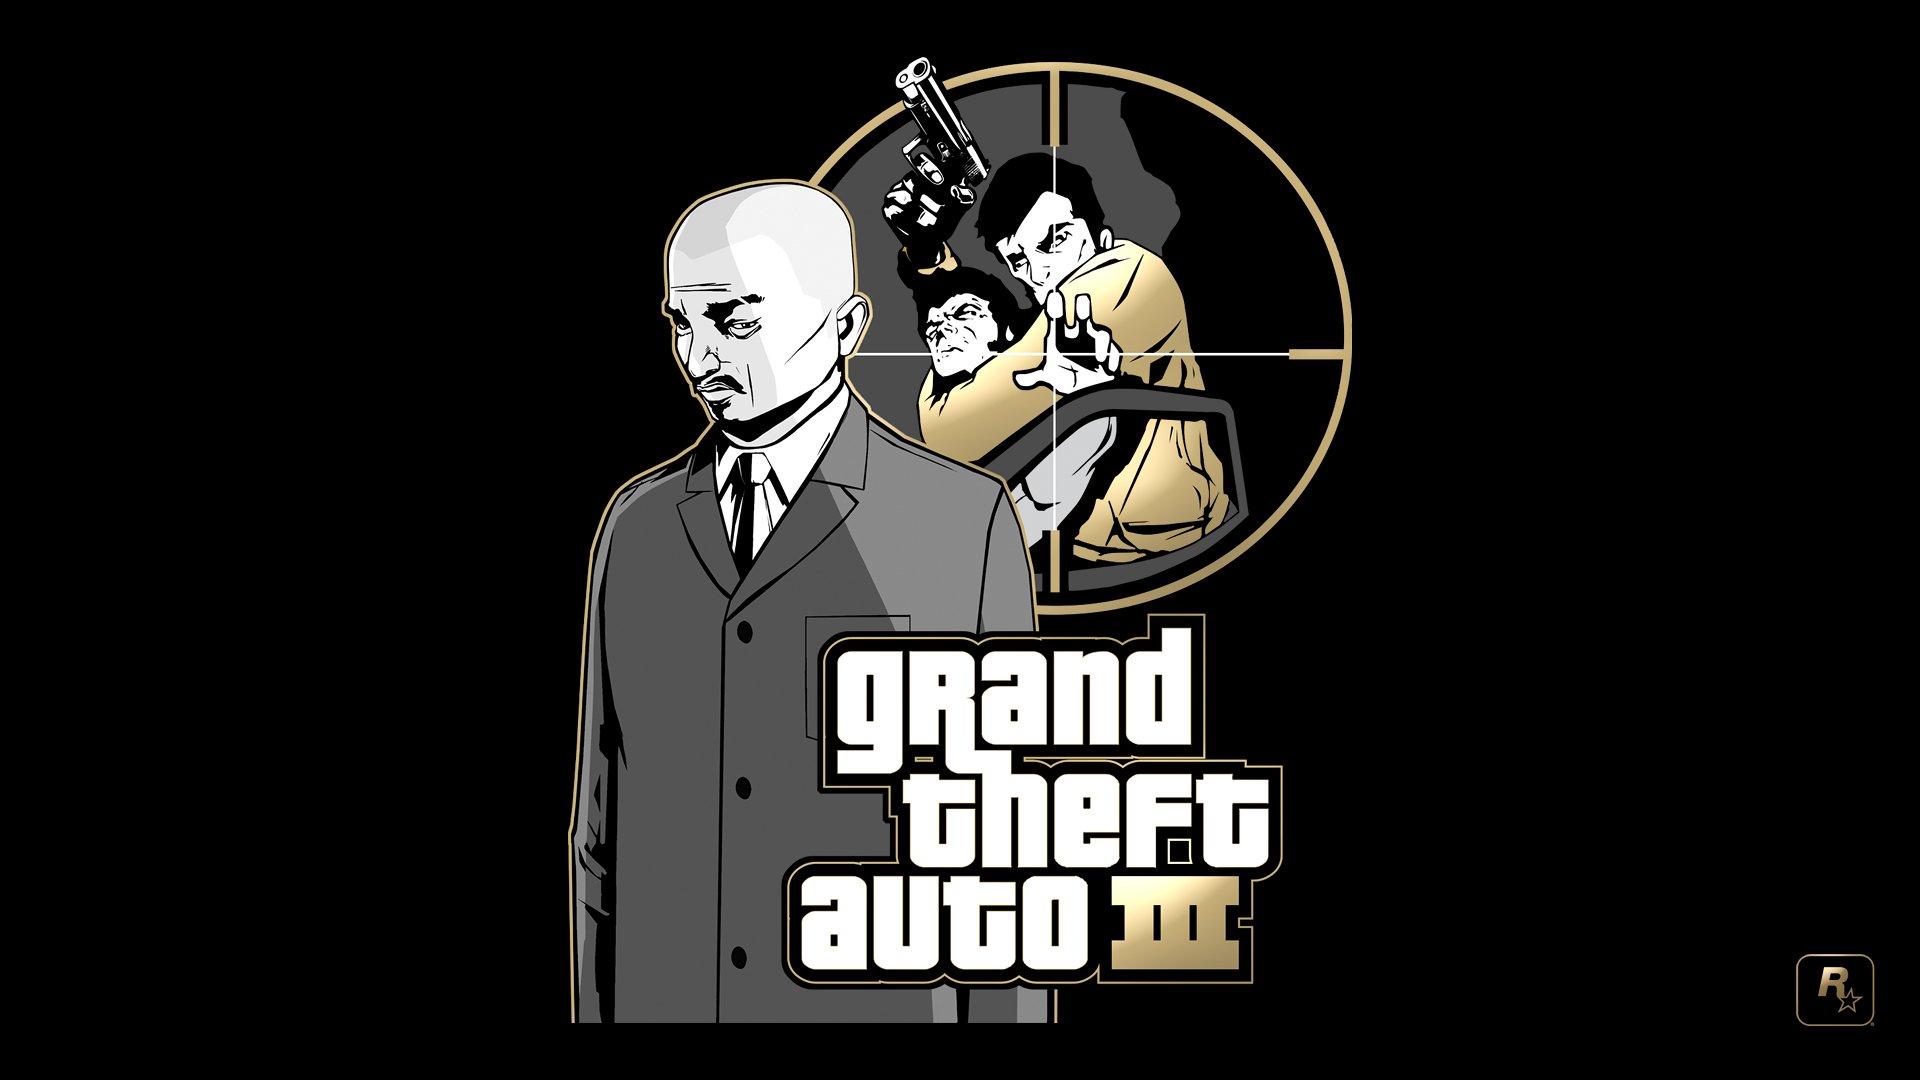 Grand Theft Auto Iii Hd Wallpaper Background Image 1920x1080